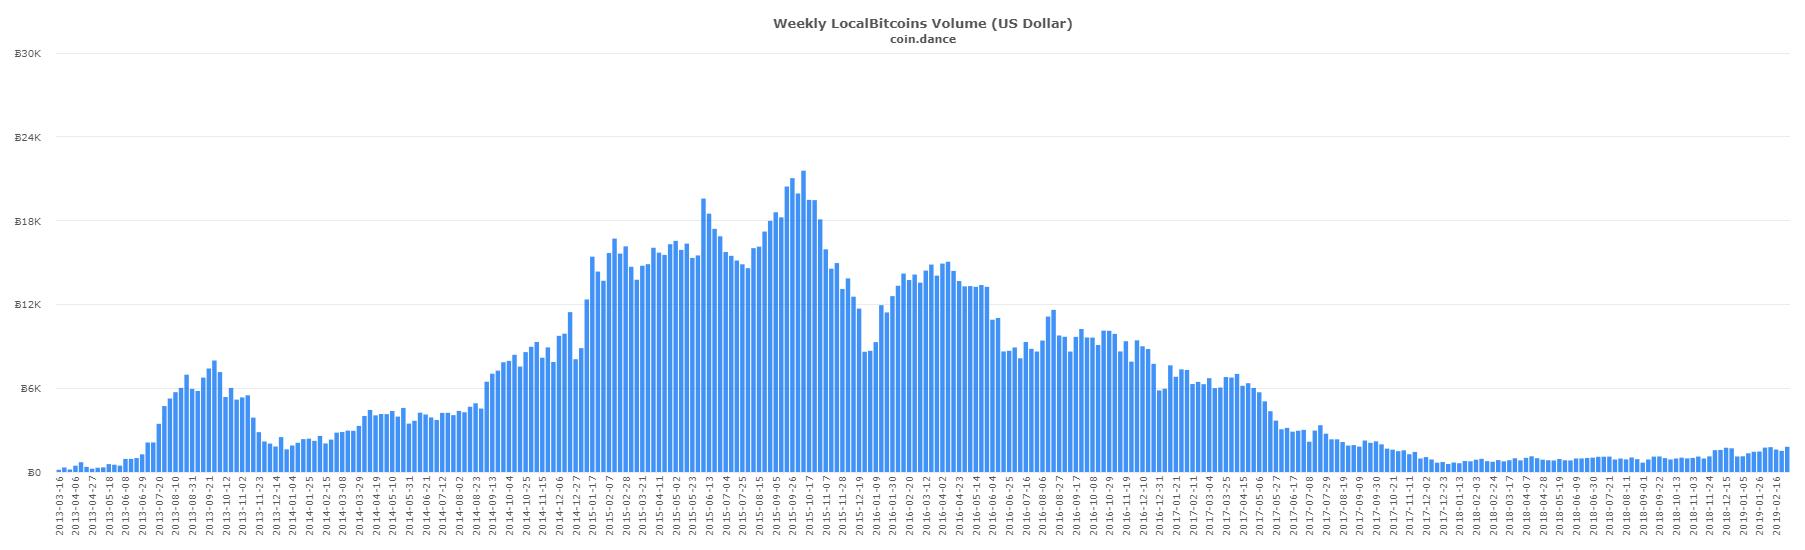 P2P Markets: Russian Localbitcoins Trade Outpaces Venezuela